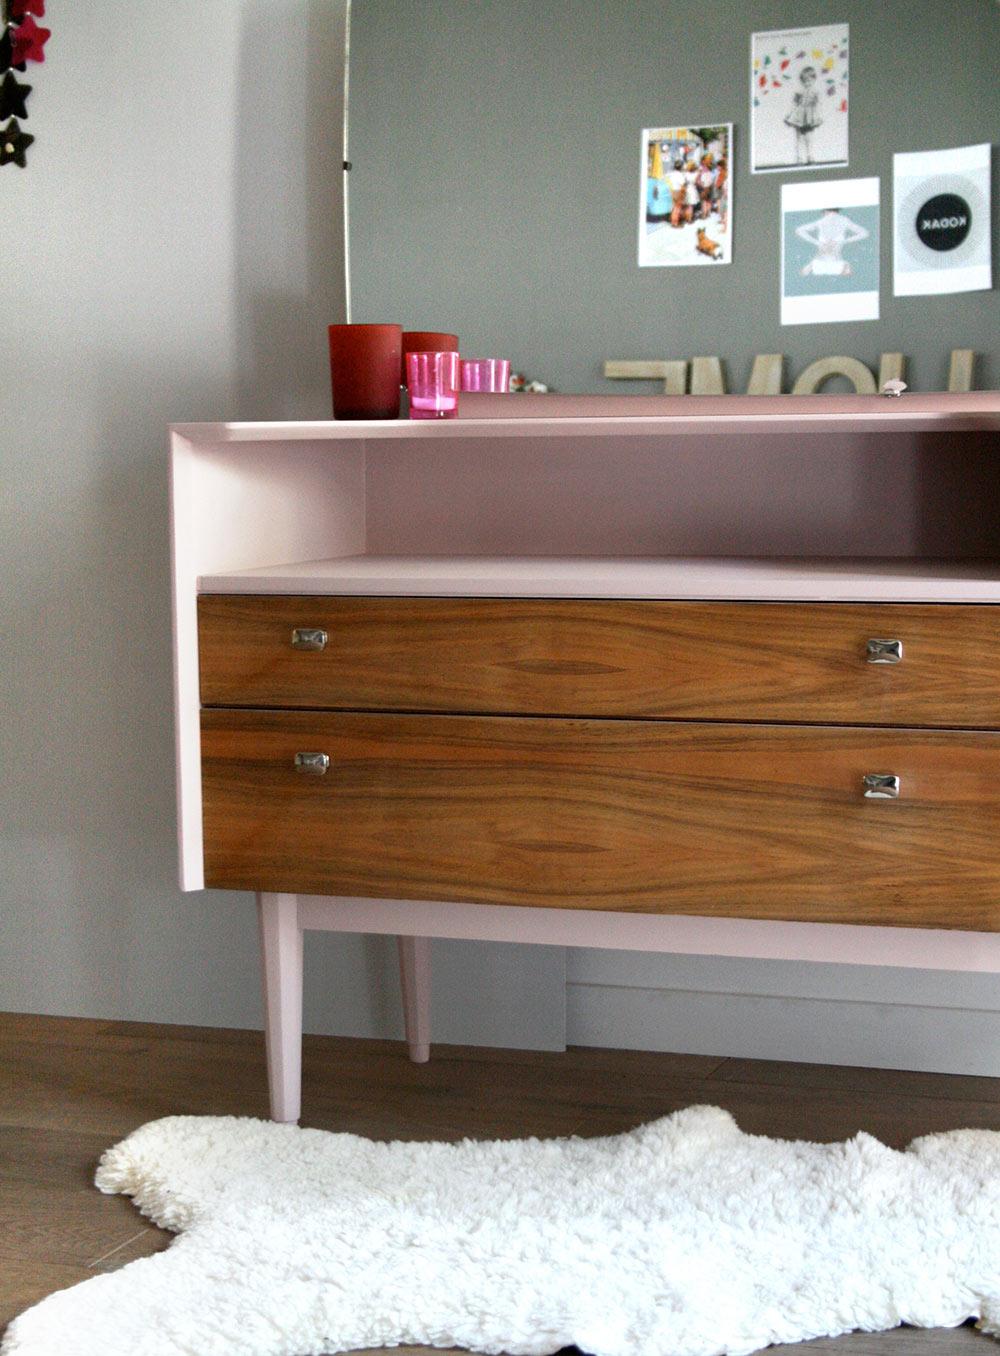 meuble coiffeuse bureau coiffeuse songmics coiffeuse table de maquillage grande com with meuble. Black Bedroom Furniture Sets. Home Design Ideas